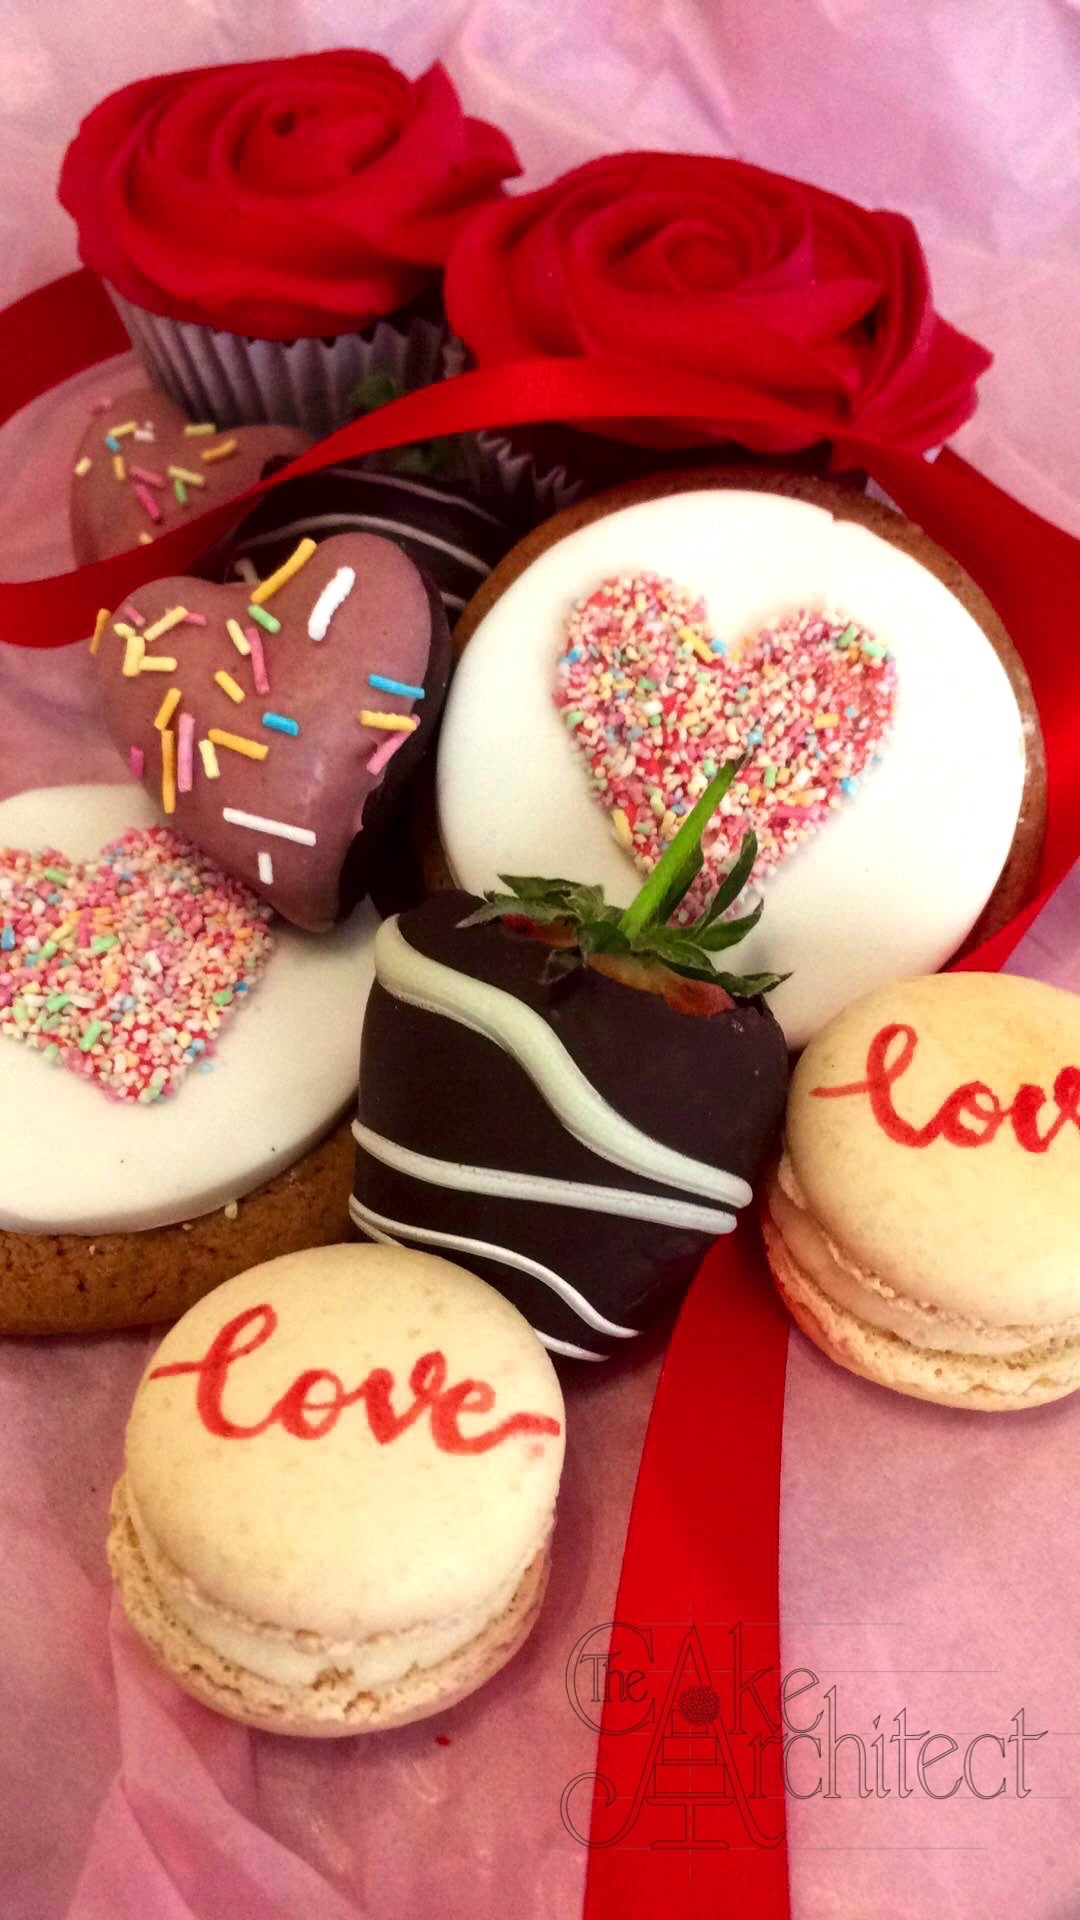 Romantic Valentines Day Cakes, The Cake Architect, Bradford-on-Avon